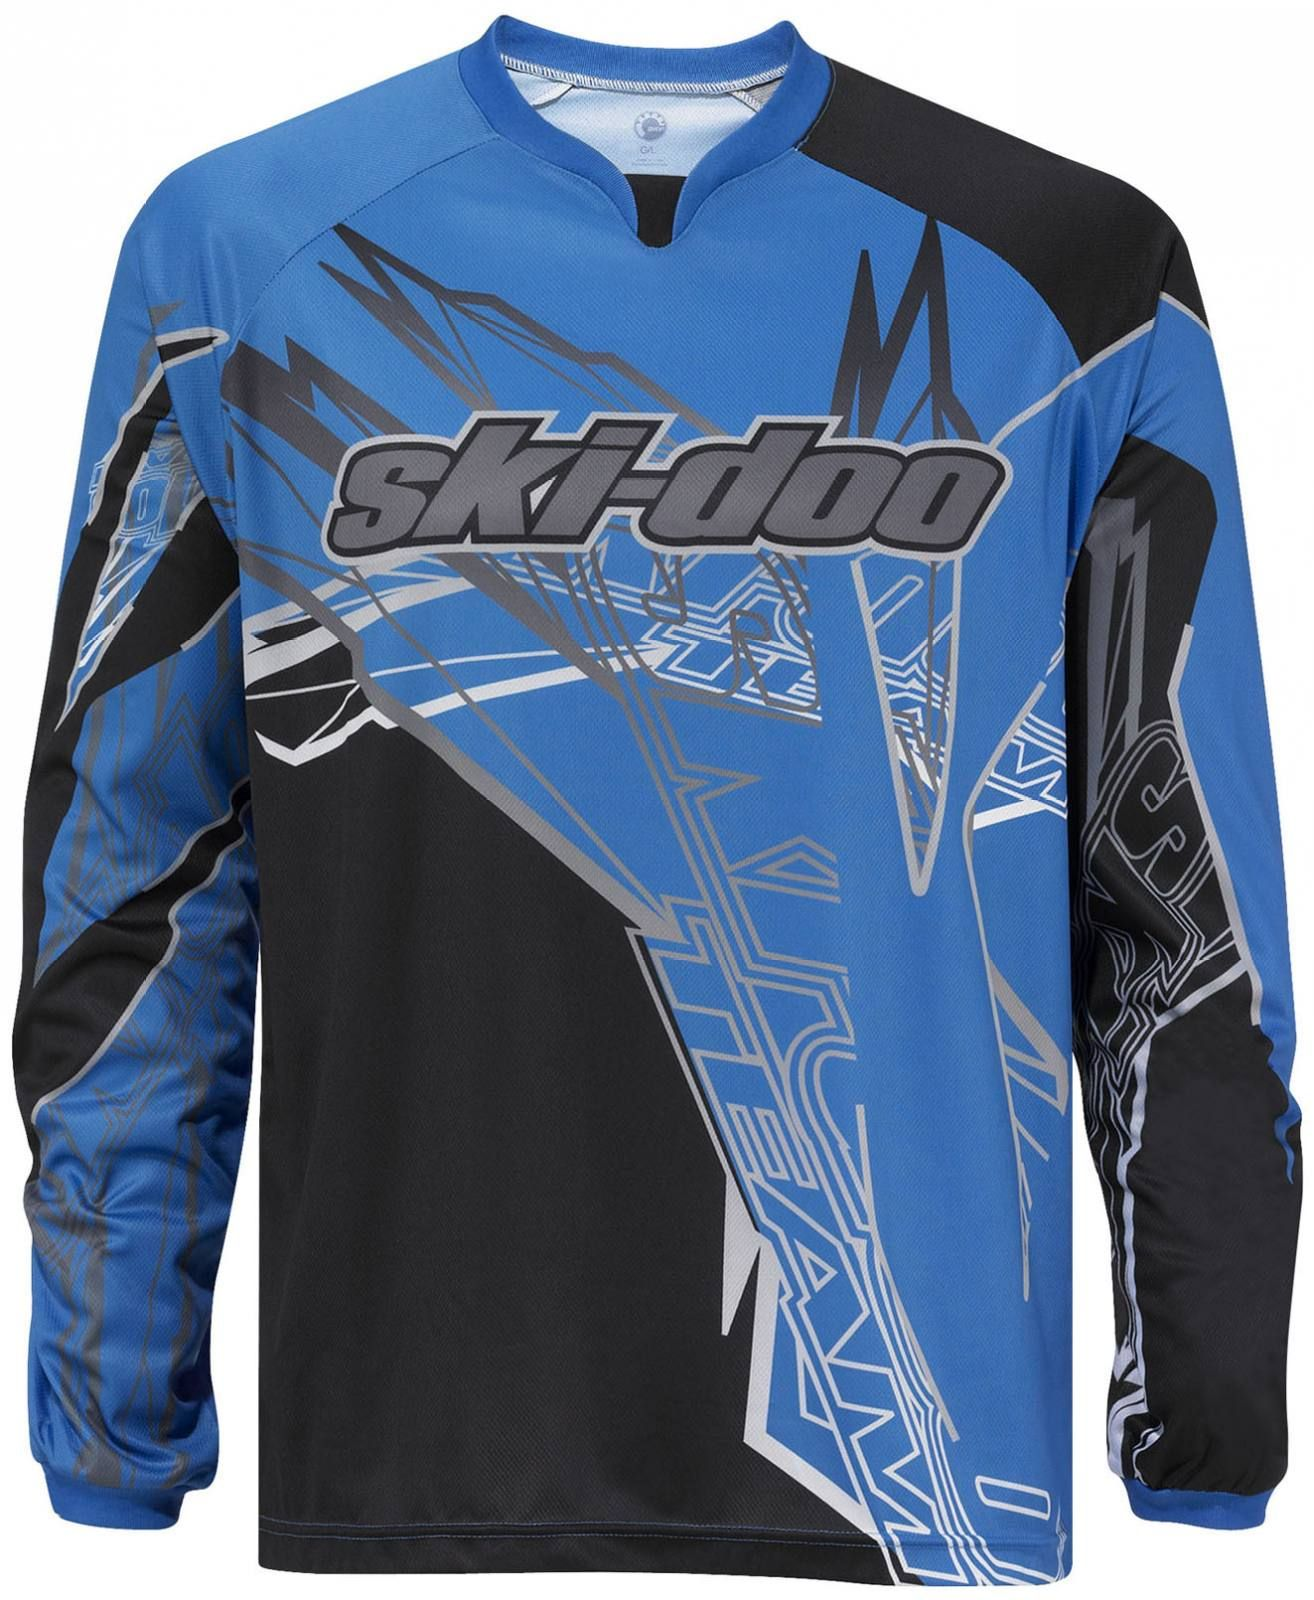 Ski Doo Mountain Jersey From Tousley Motorsports Long Sleeve Tshirt Men Mens Outfits Skiing